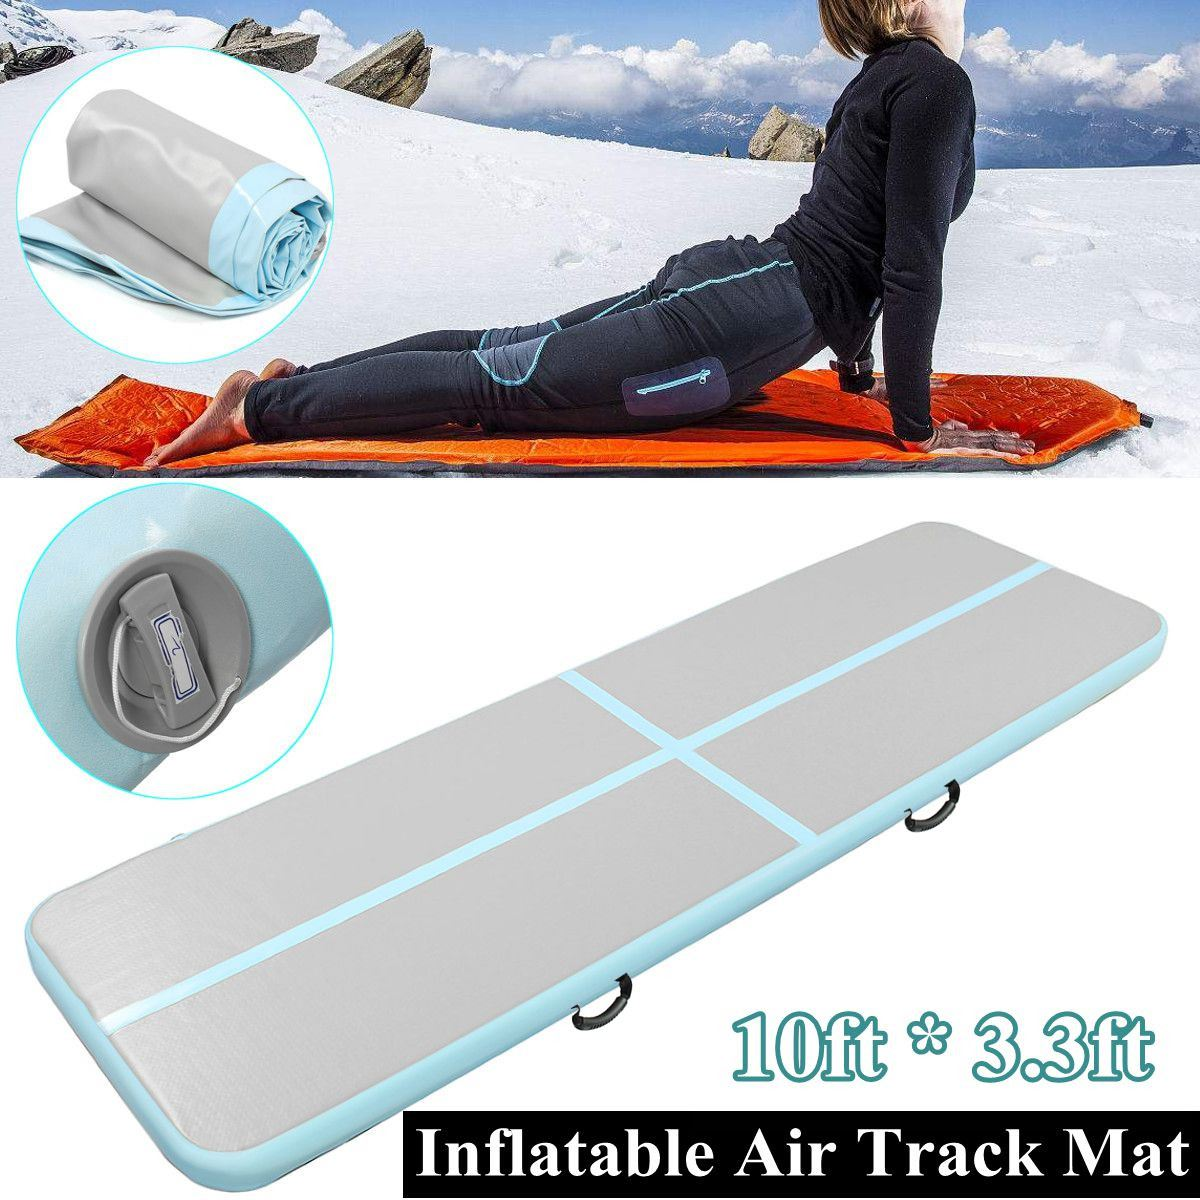 Yoga Mats 90cm*3m*10cm Inflatable Tumble Track Trampoline Air Track Floor Home GYM Gymnastics Inflatable Air Tumbling Mat все цены